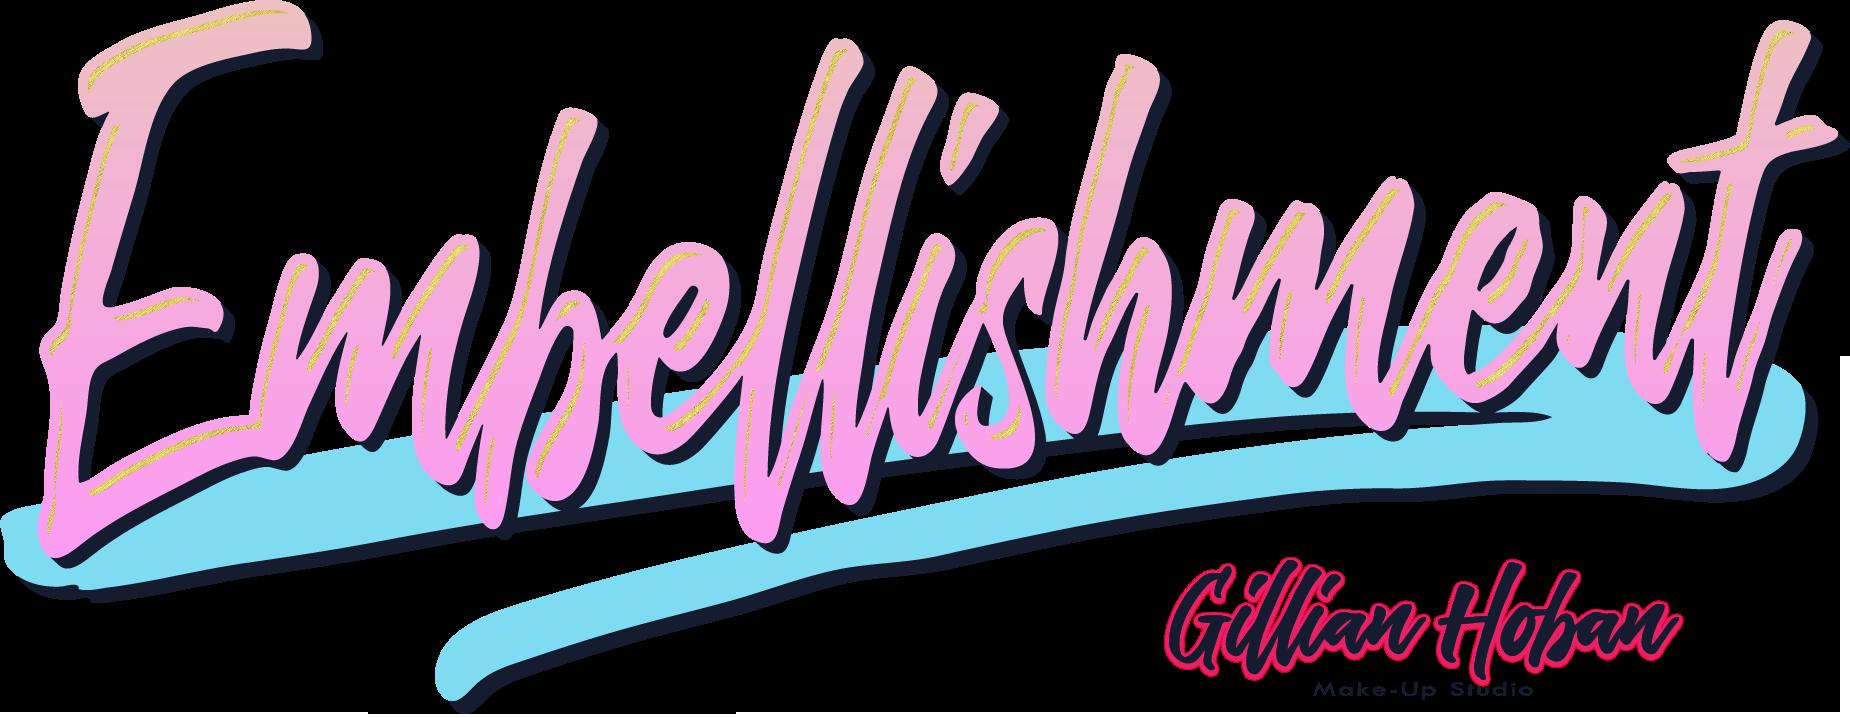 Embellishment logo designed by Dephined for Gillian Hoban Make-Up Studio